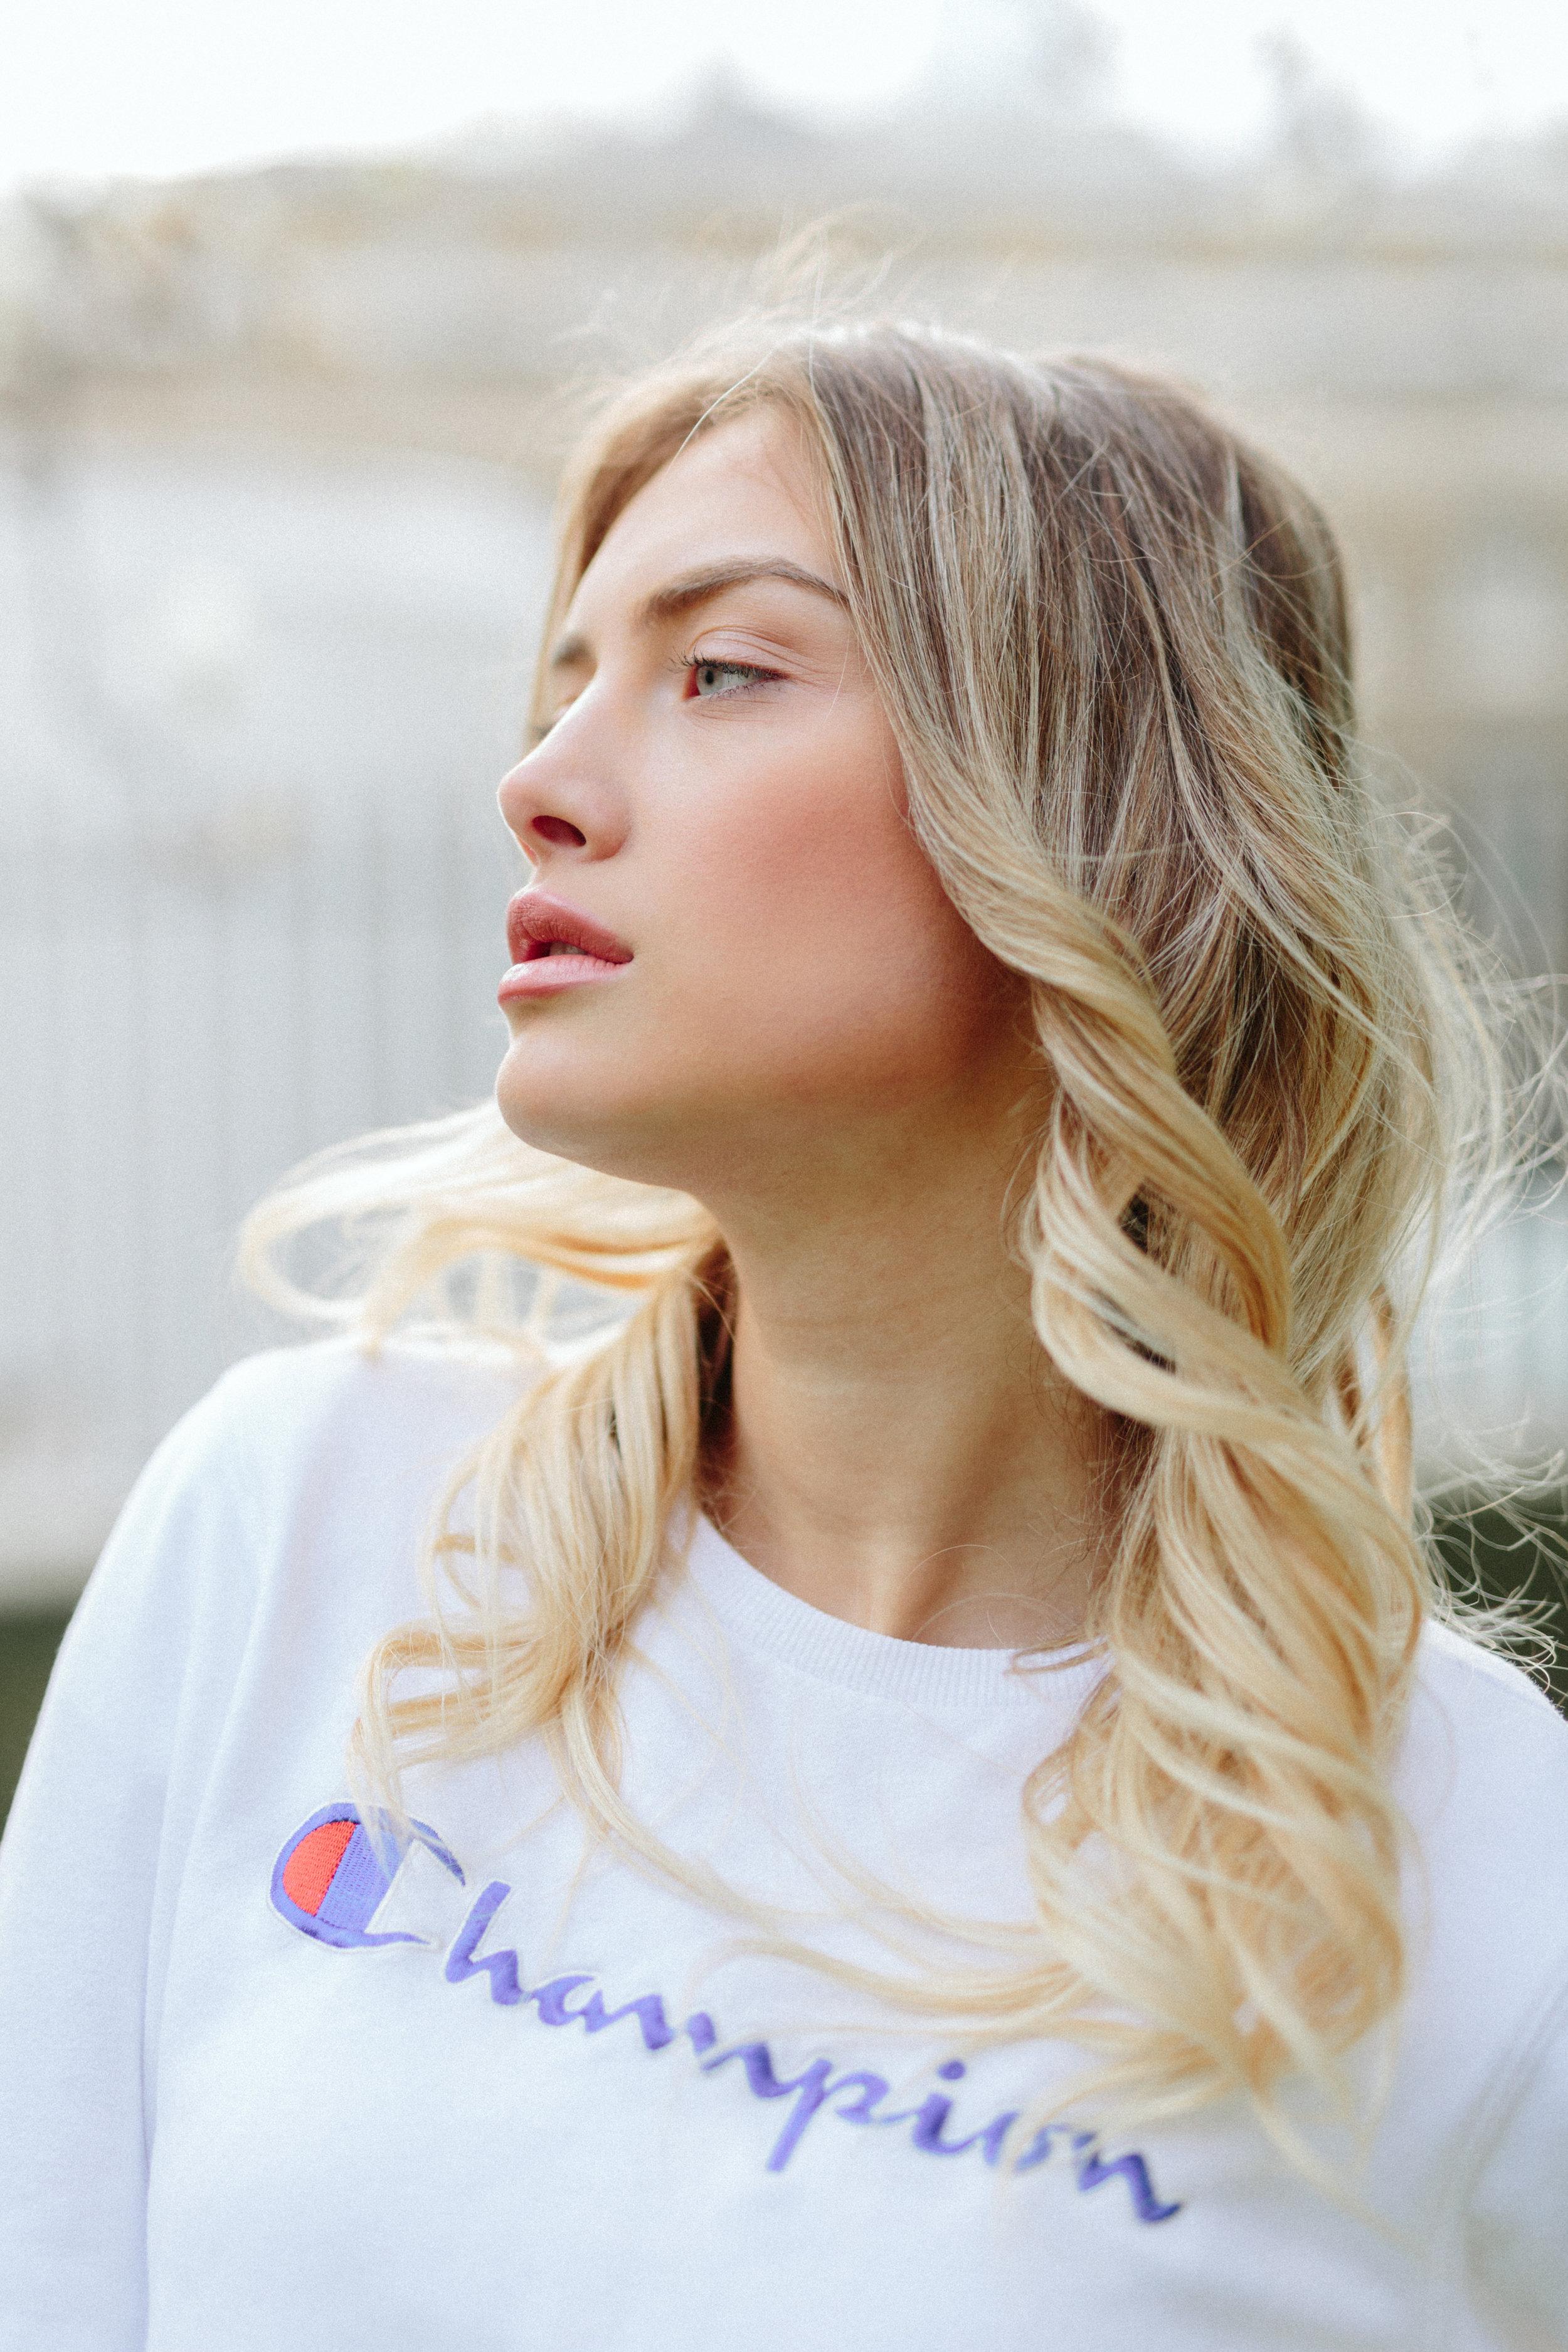 Ervina_BAME-20.jpg